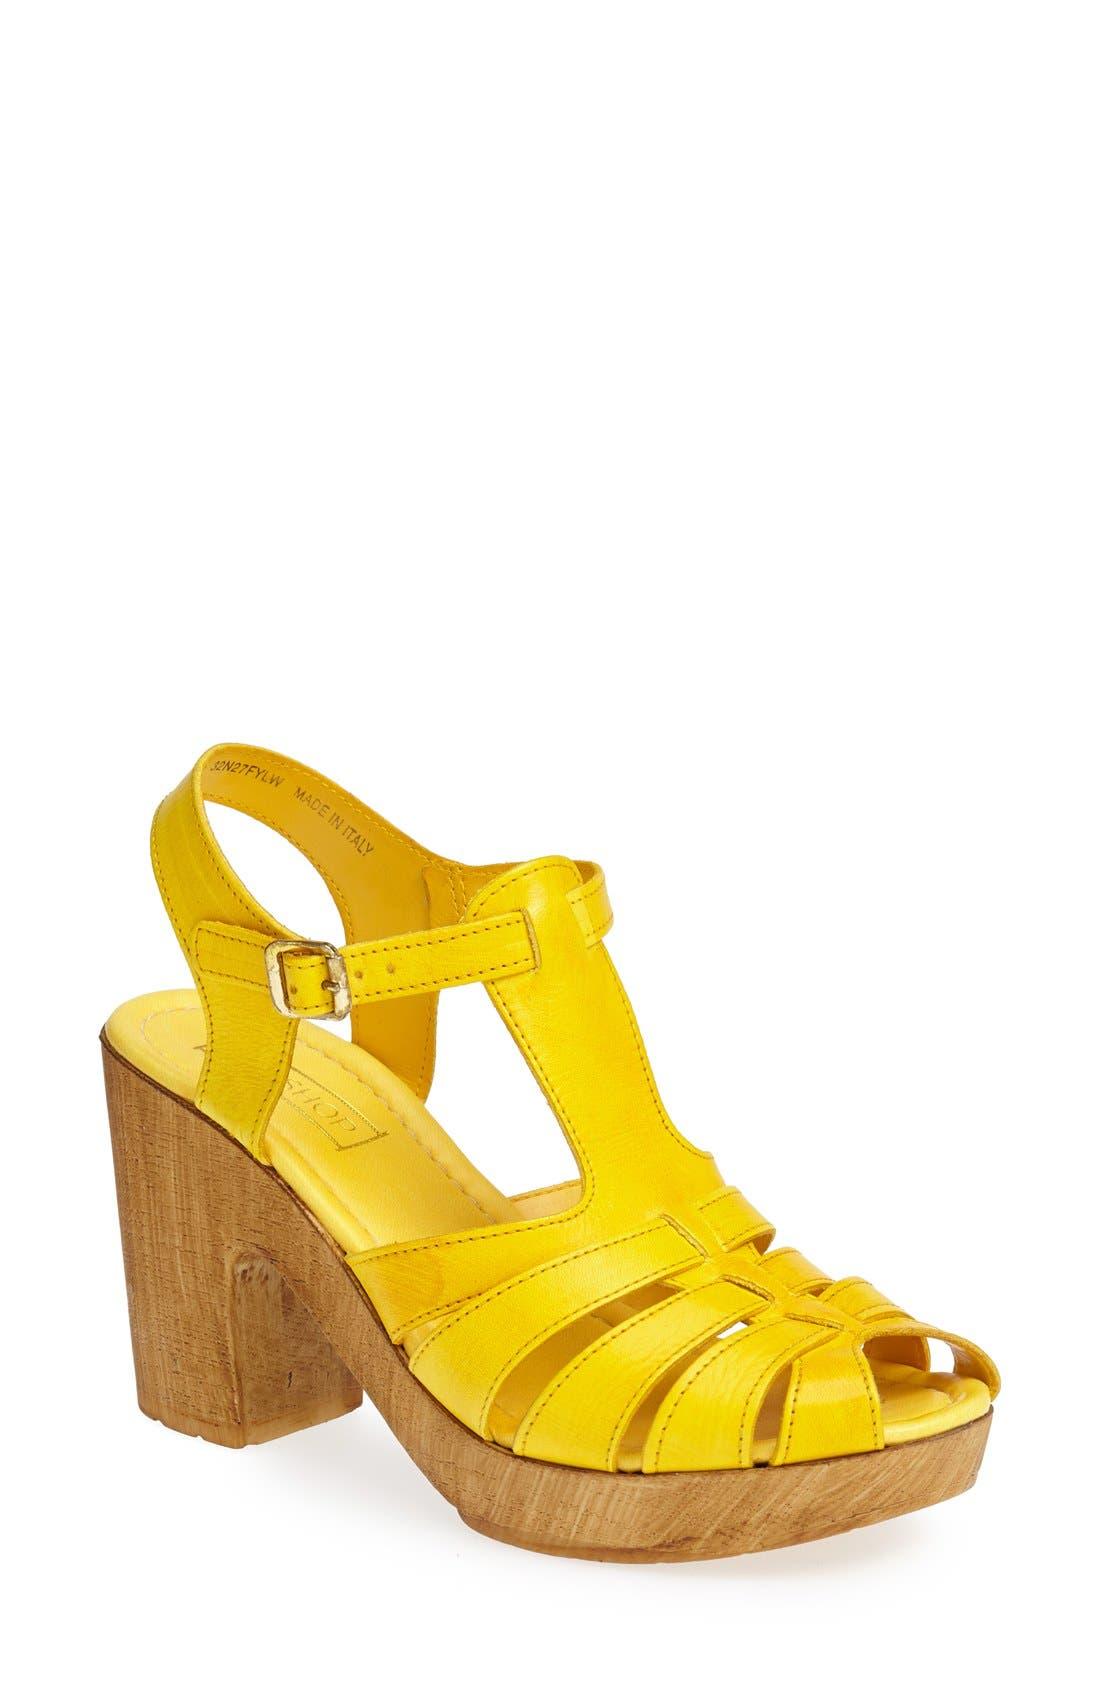 Main Image - Topshop 'Notch' Strappy Sandal (Women)